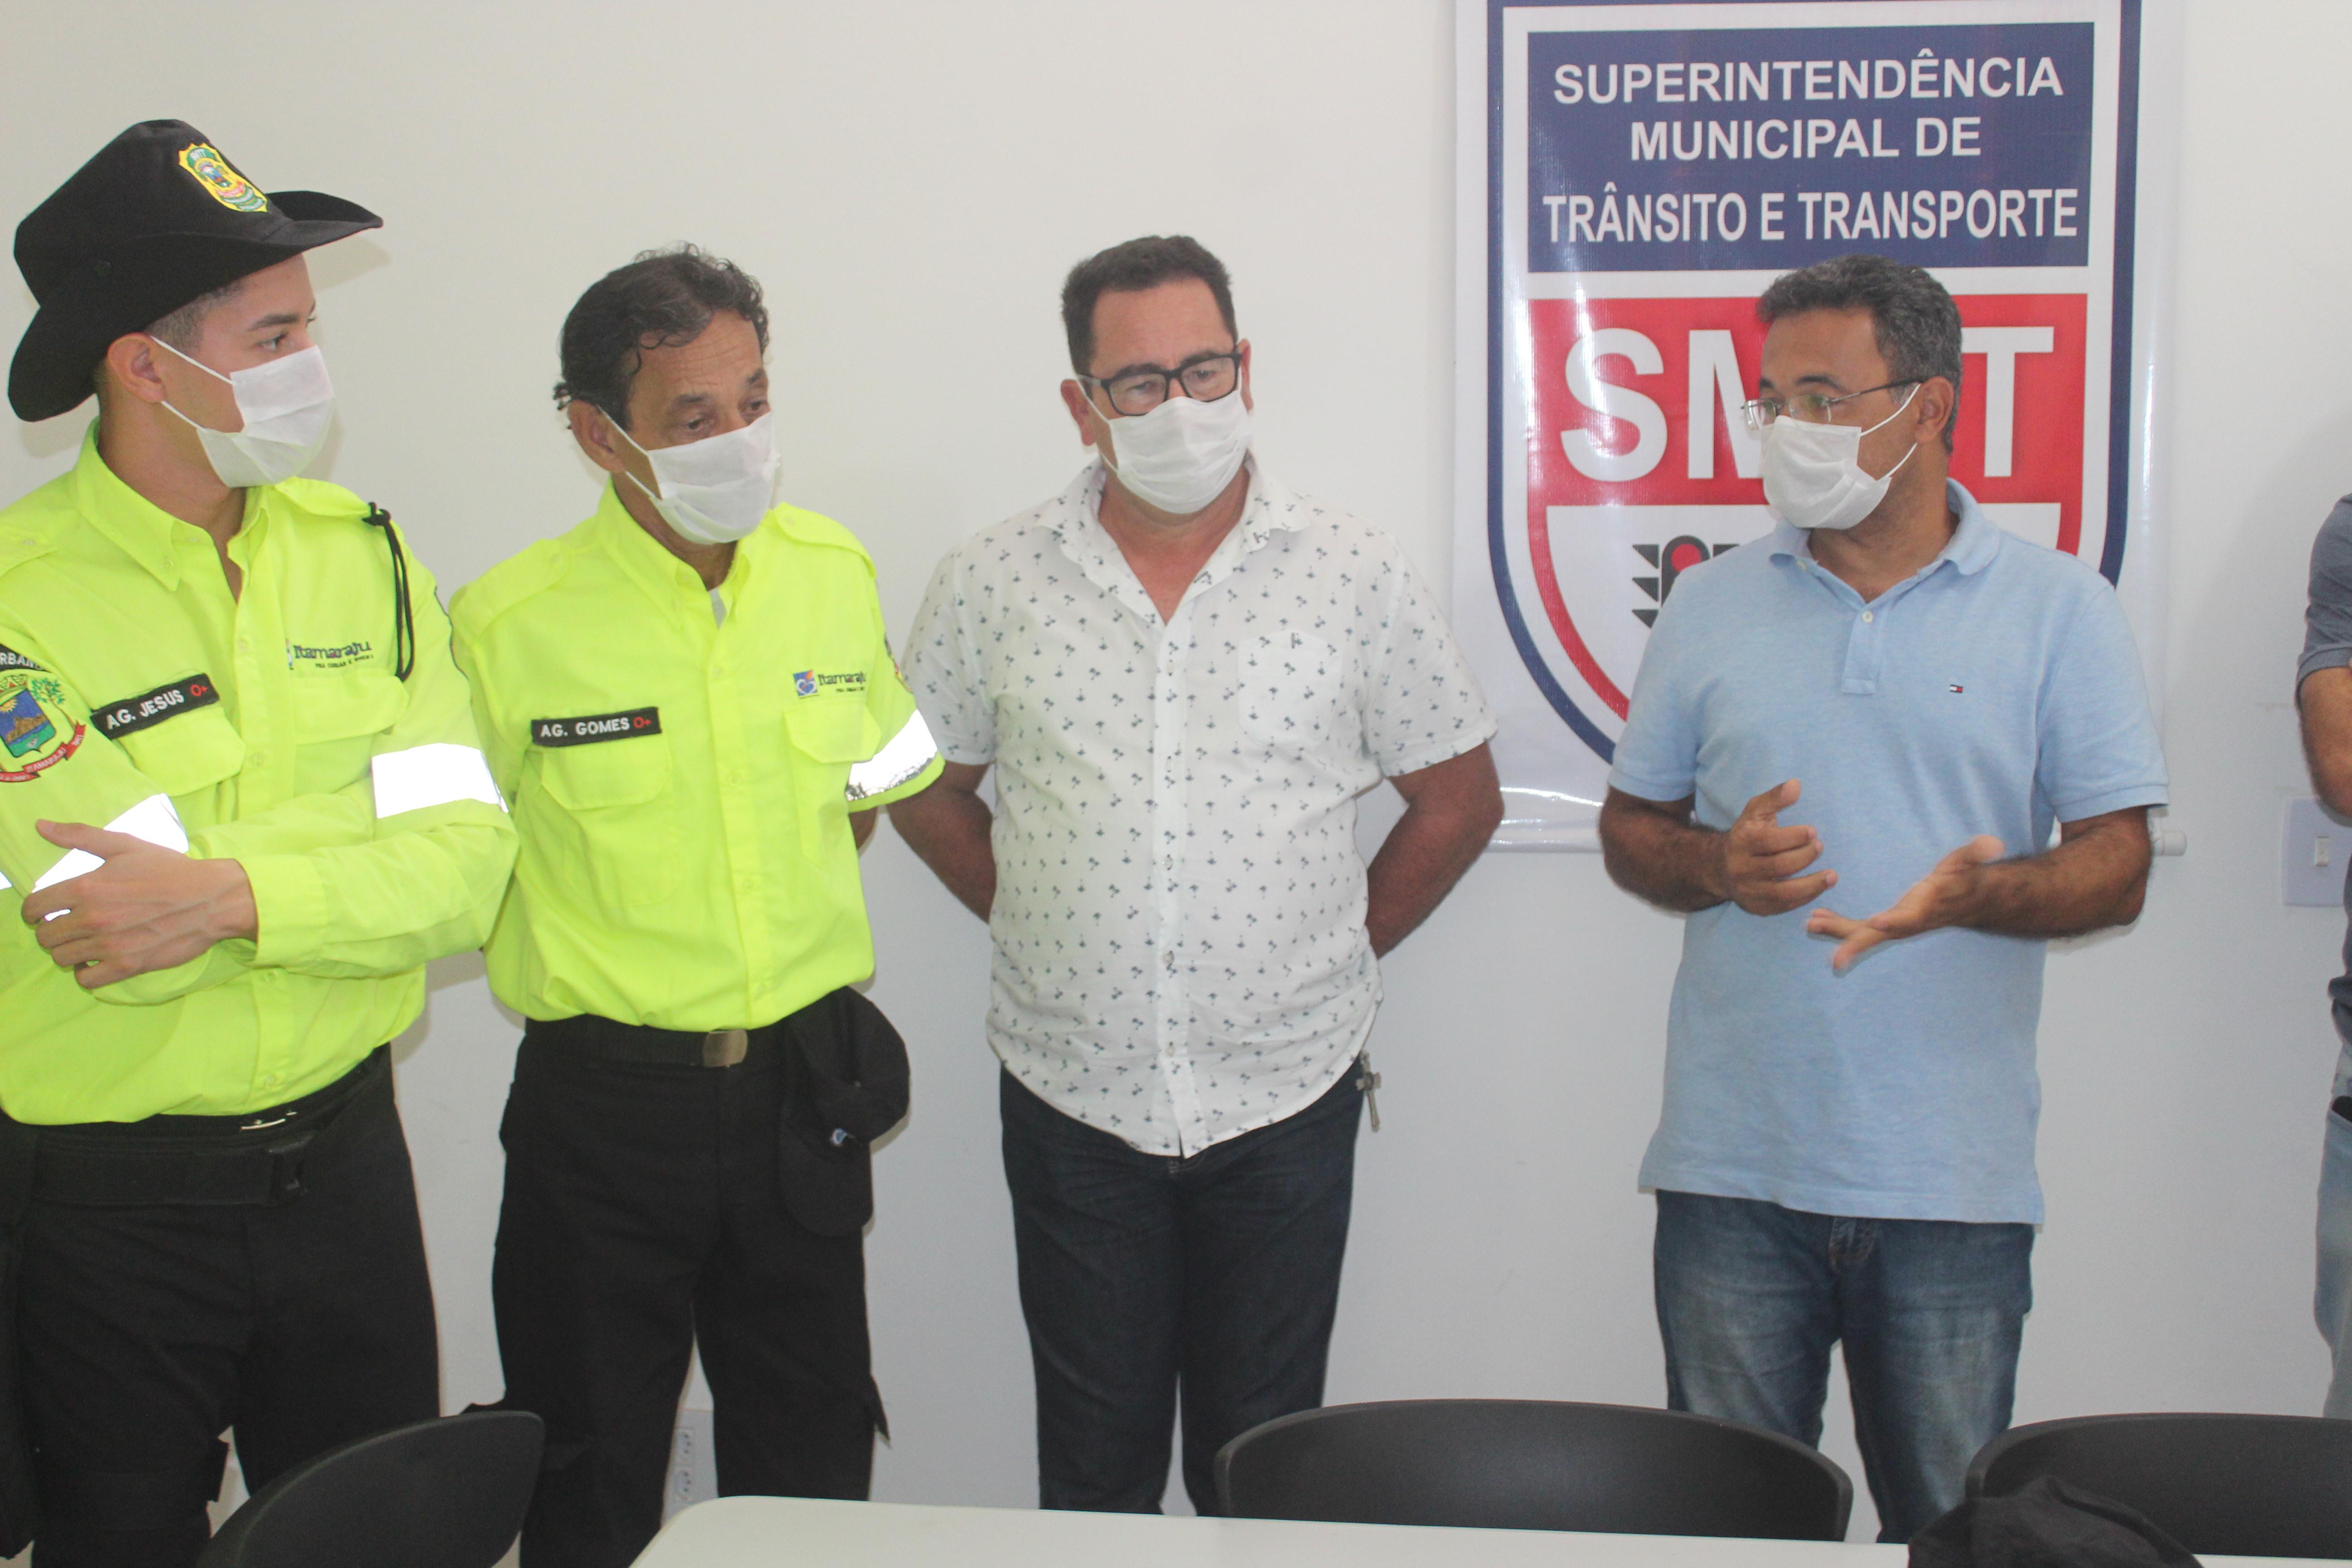 Prefeitura de Itamaraju realiza entrega de novos uniformes para Agentes de Transito